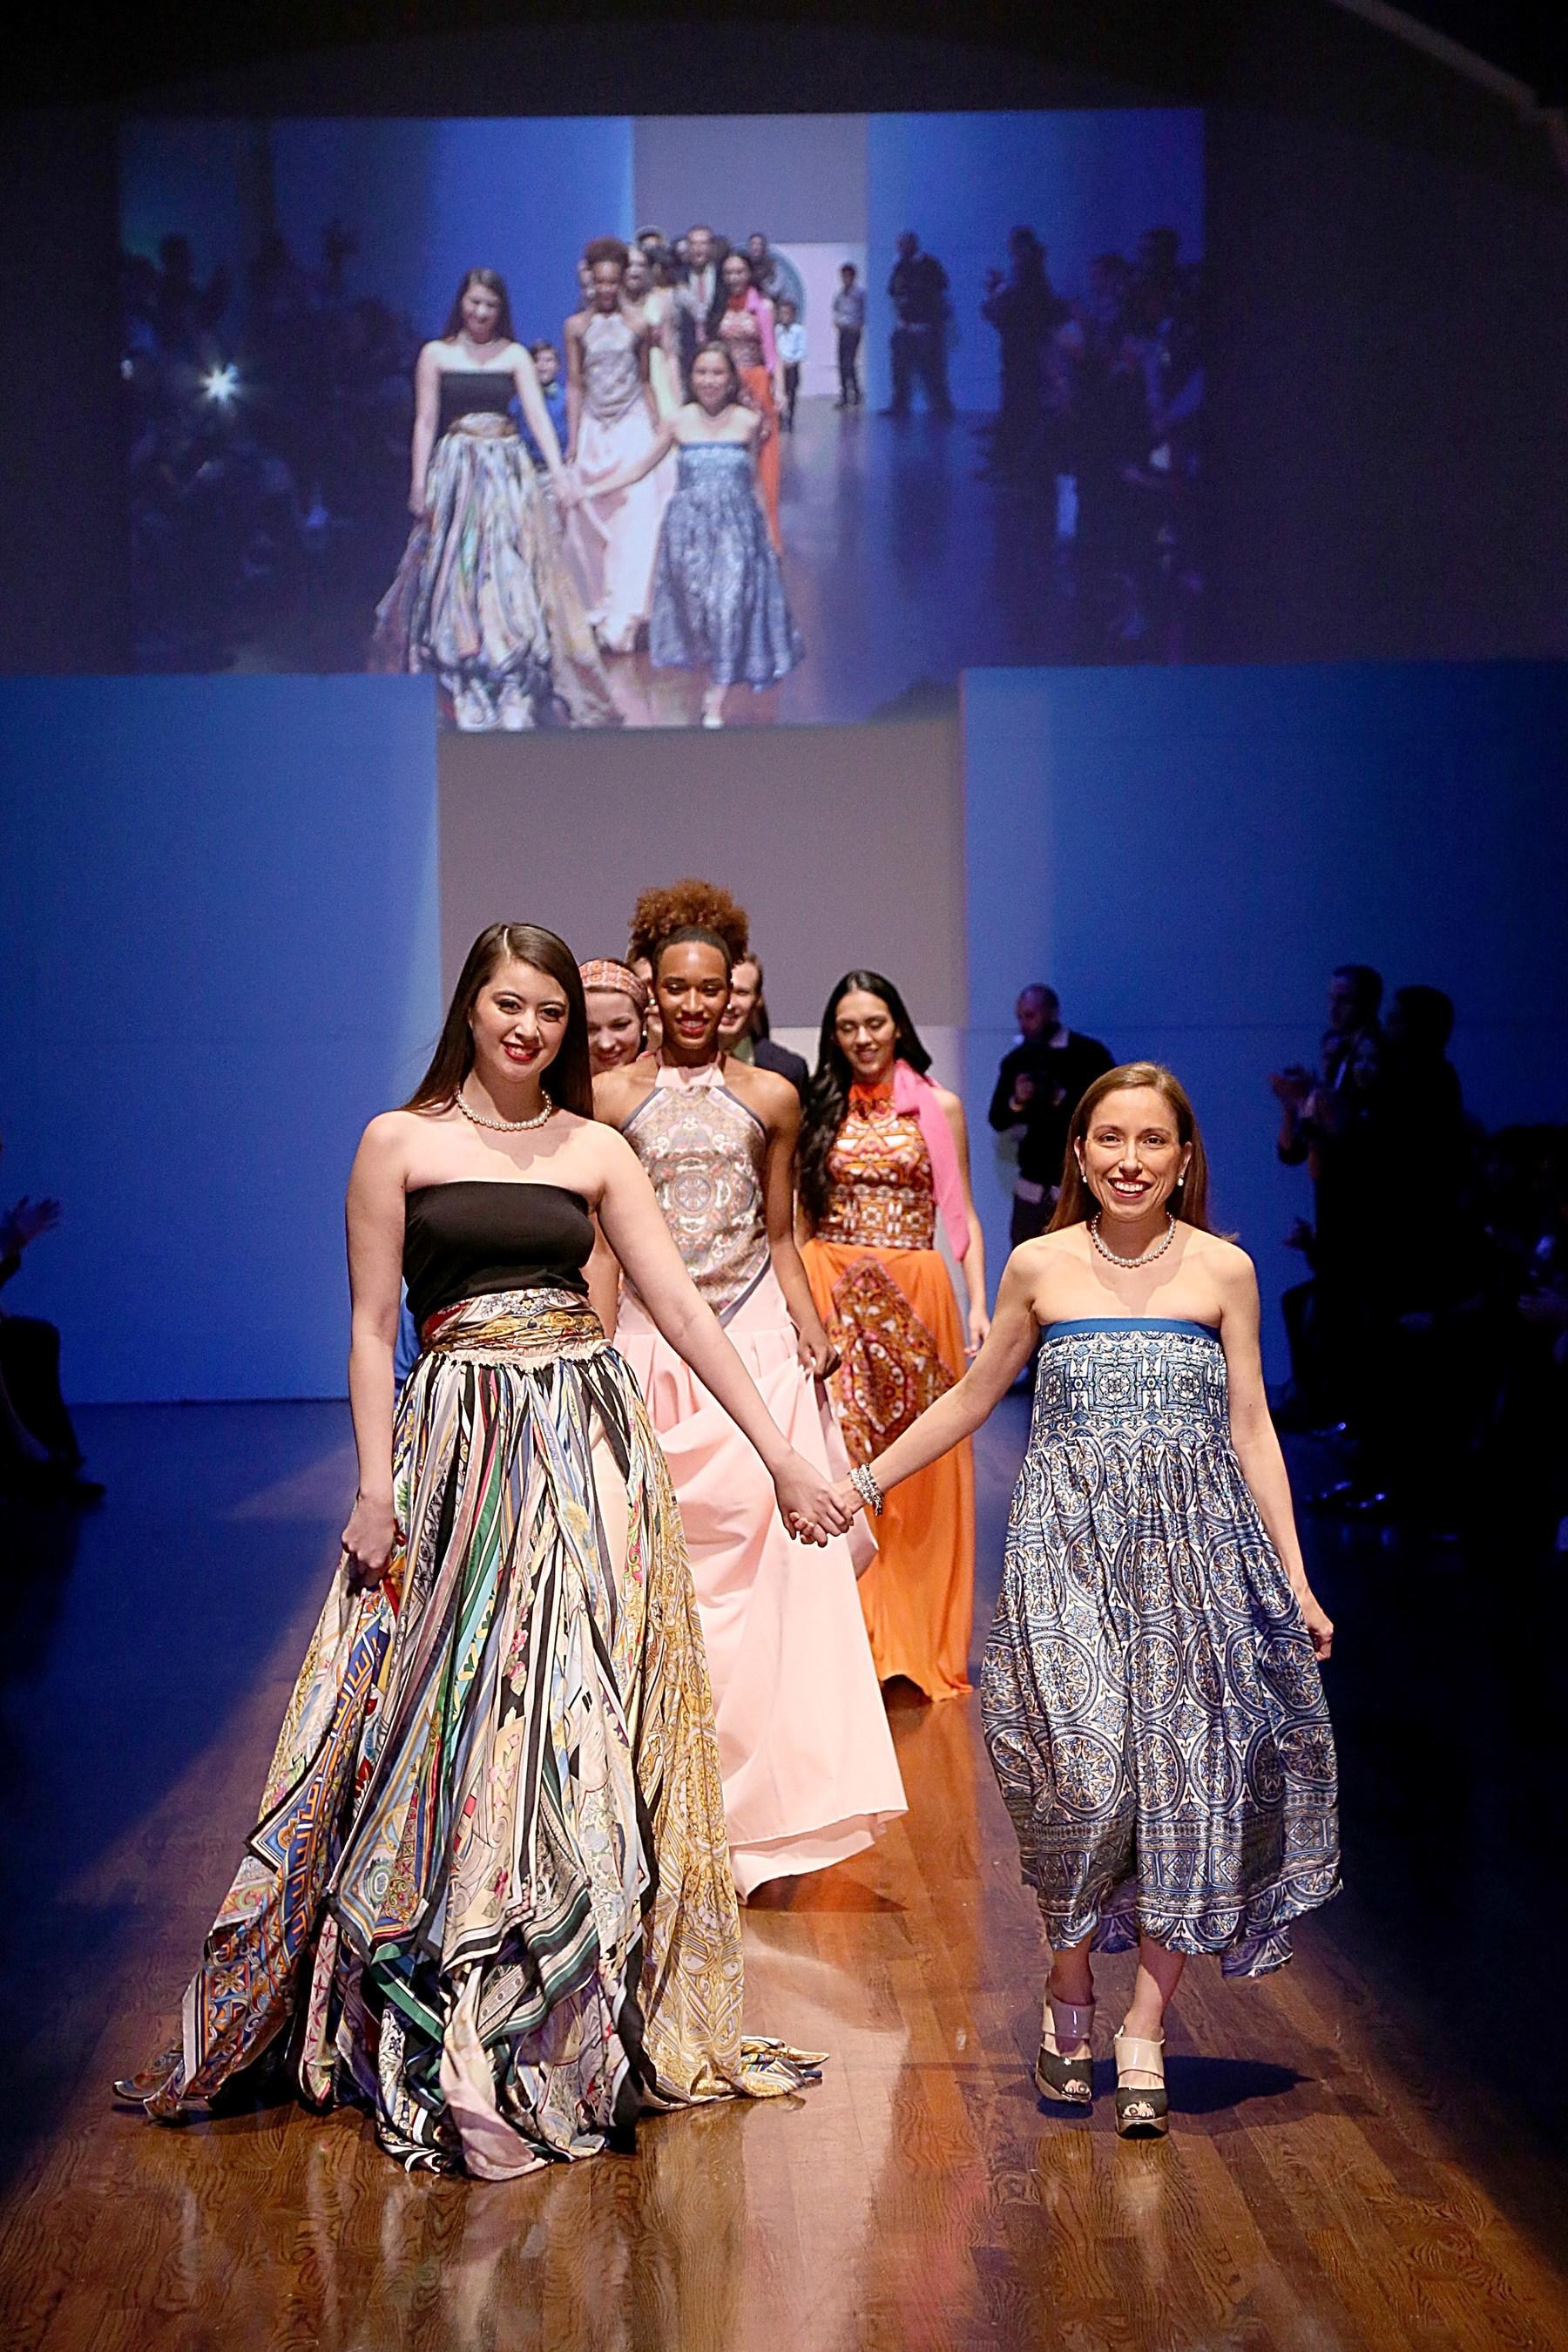 Marisol Deluna 25th Anniversary In Fashion Runway Show